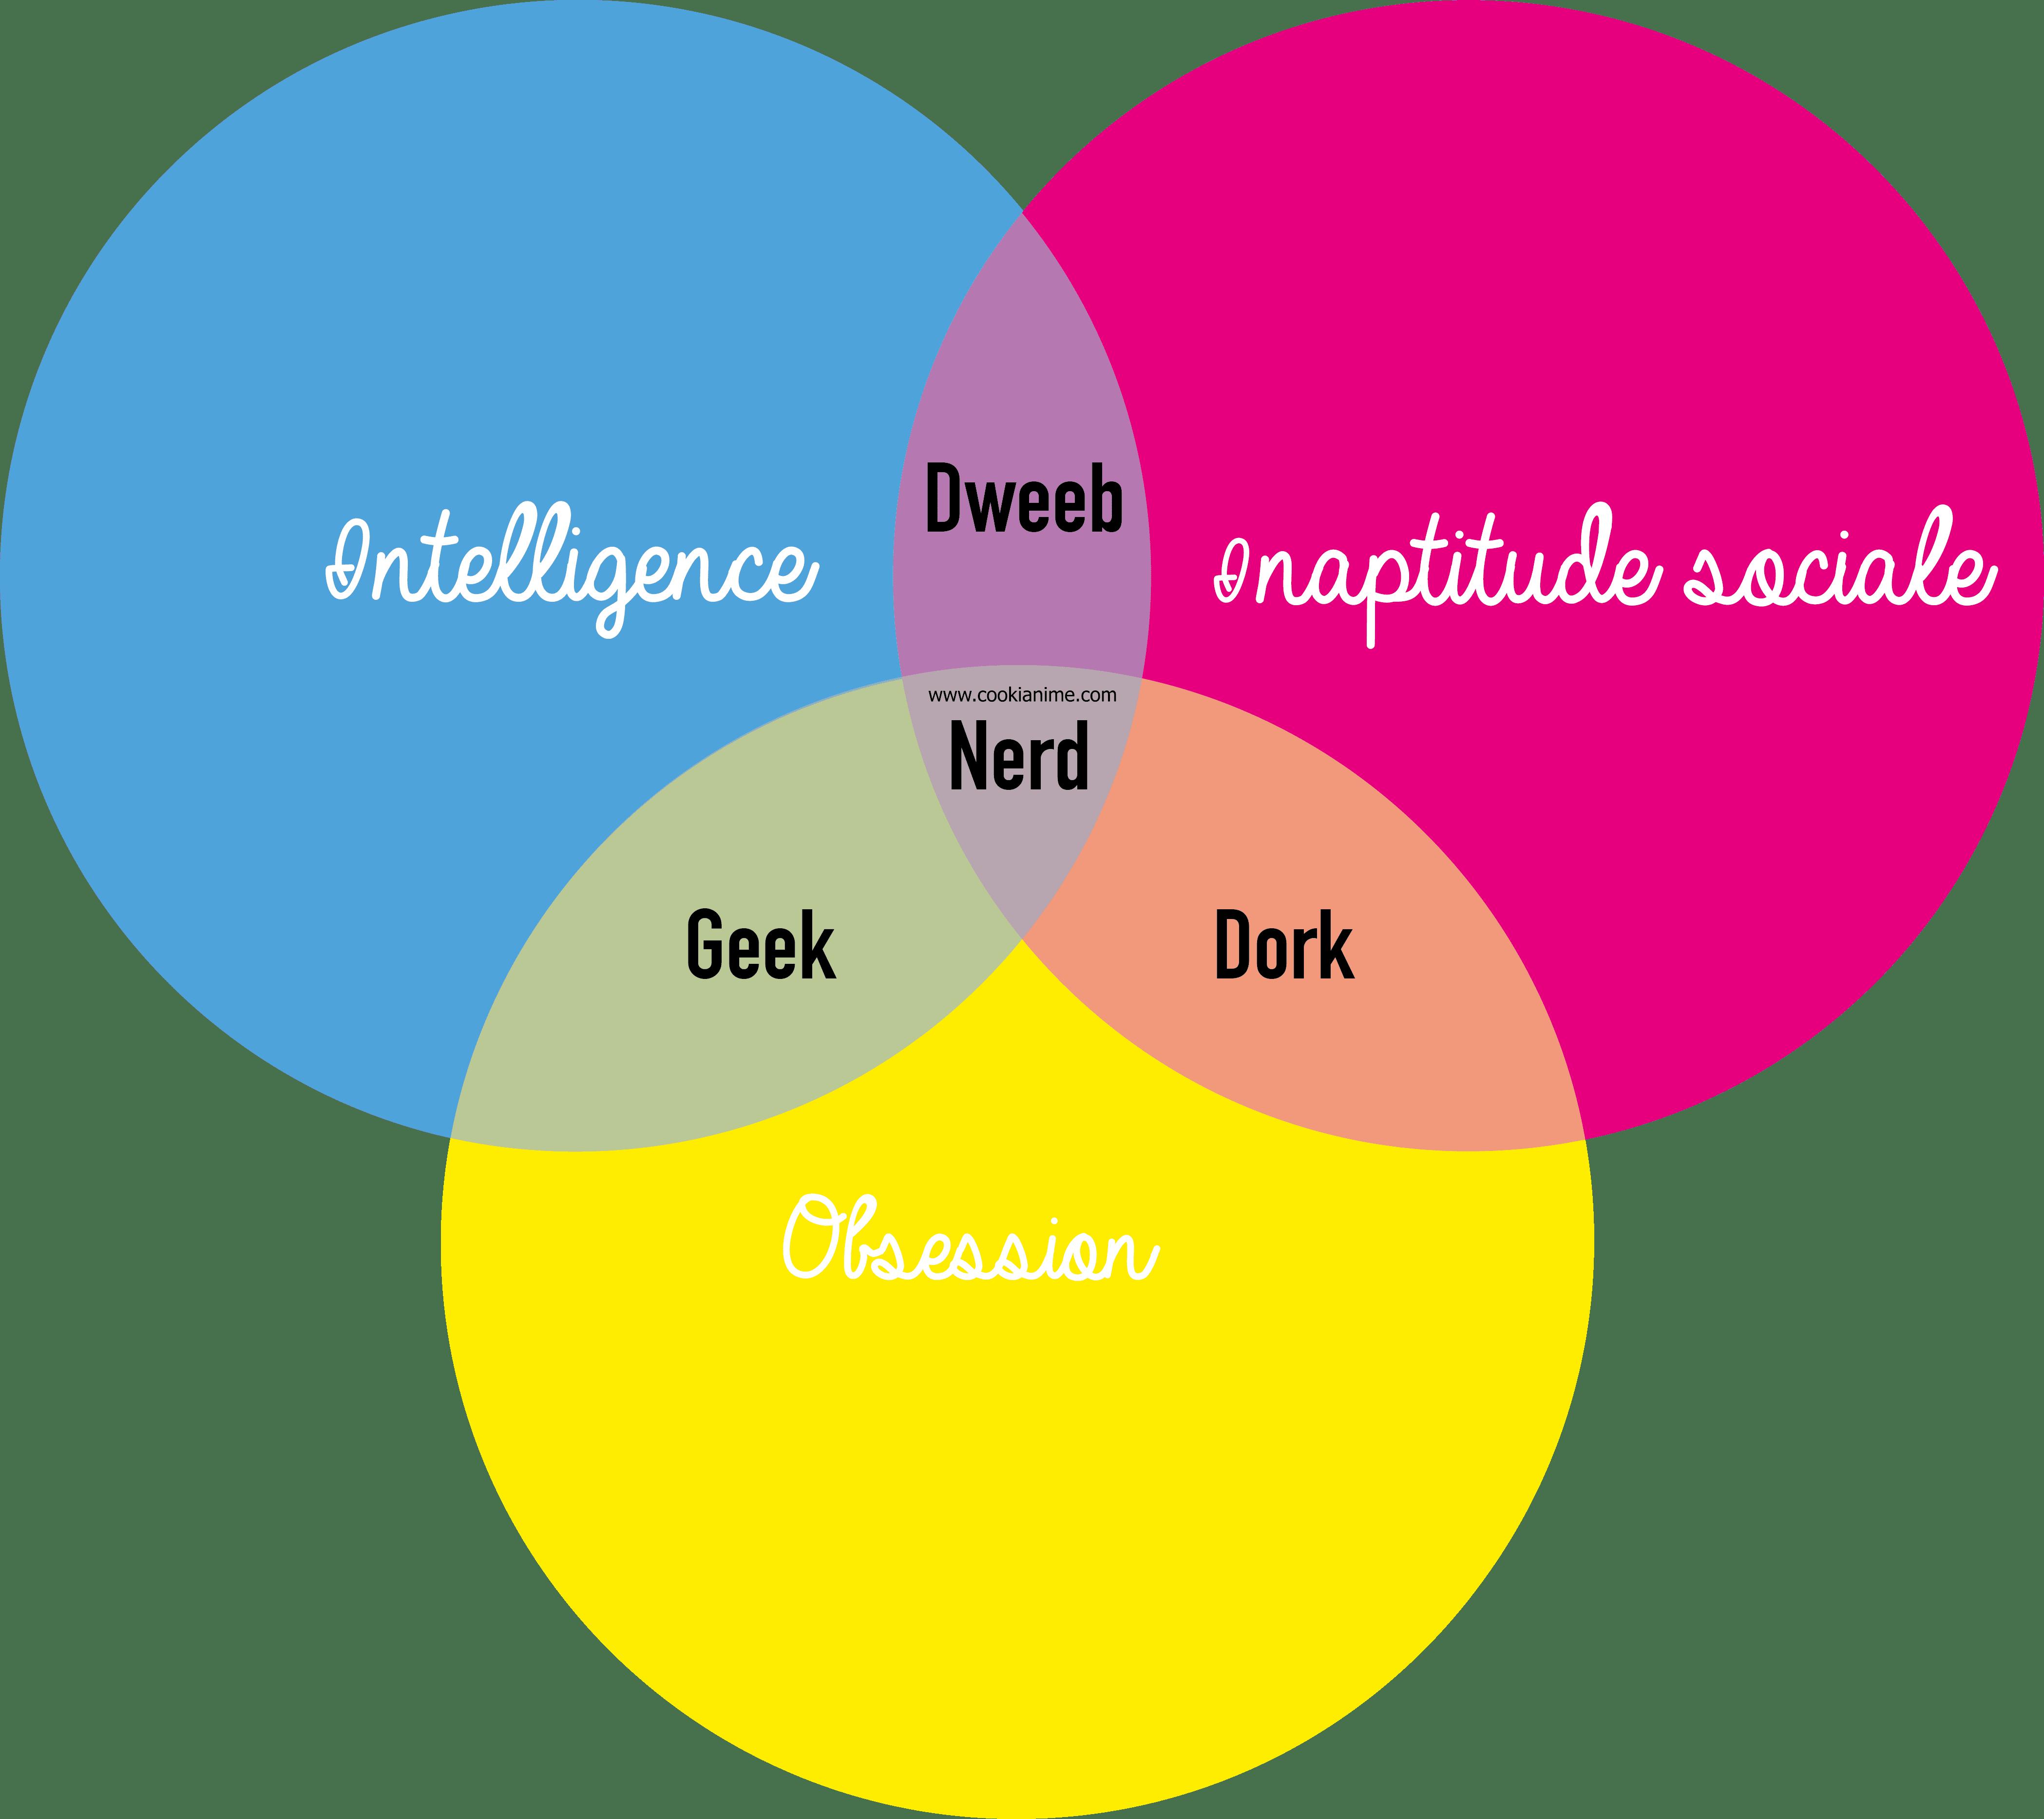 cercle explicatif geek